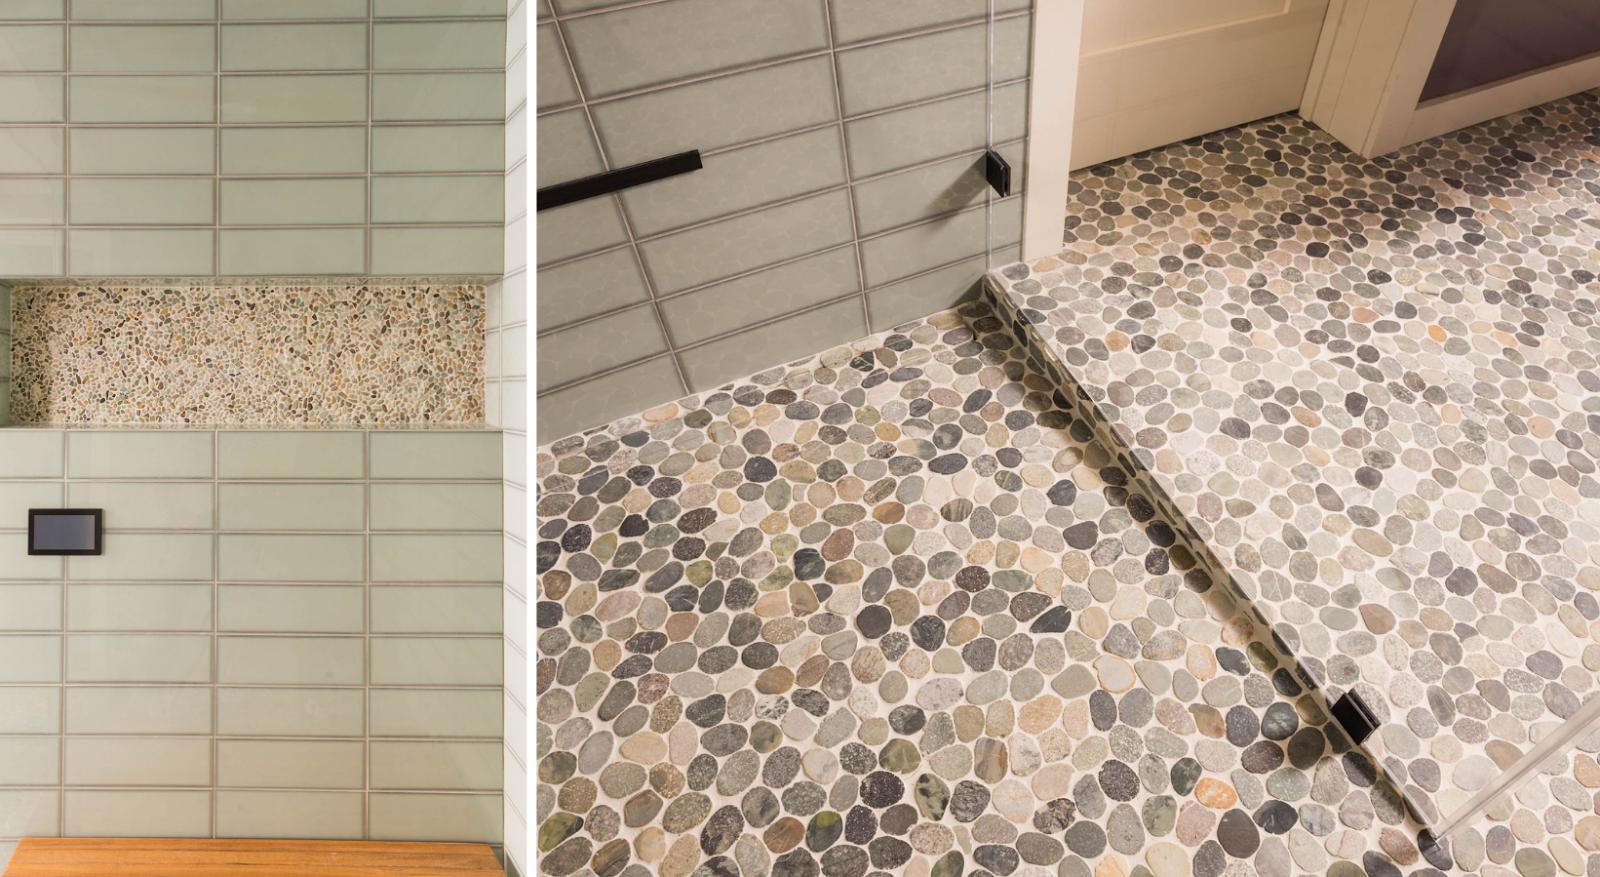 joy street design oakland master bathroom floors and shower nook in river rock